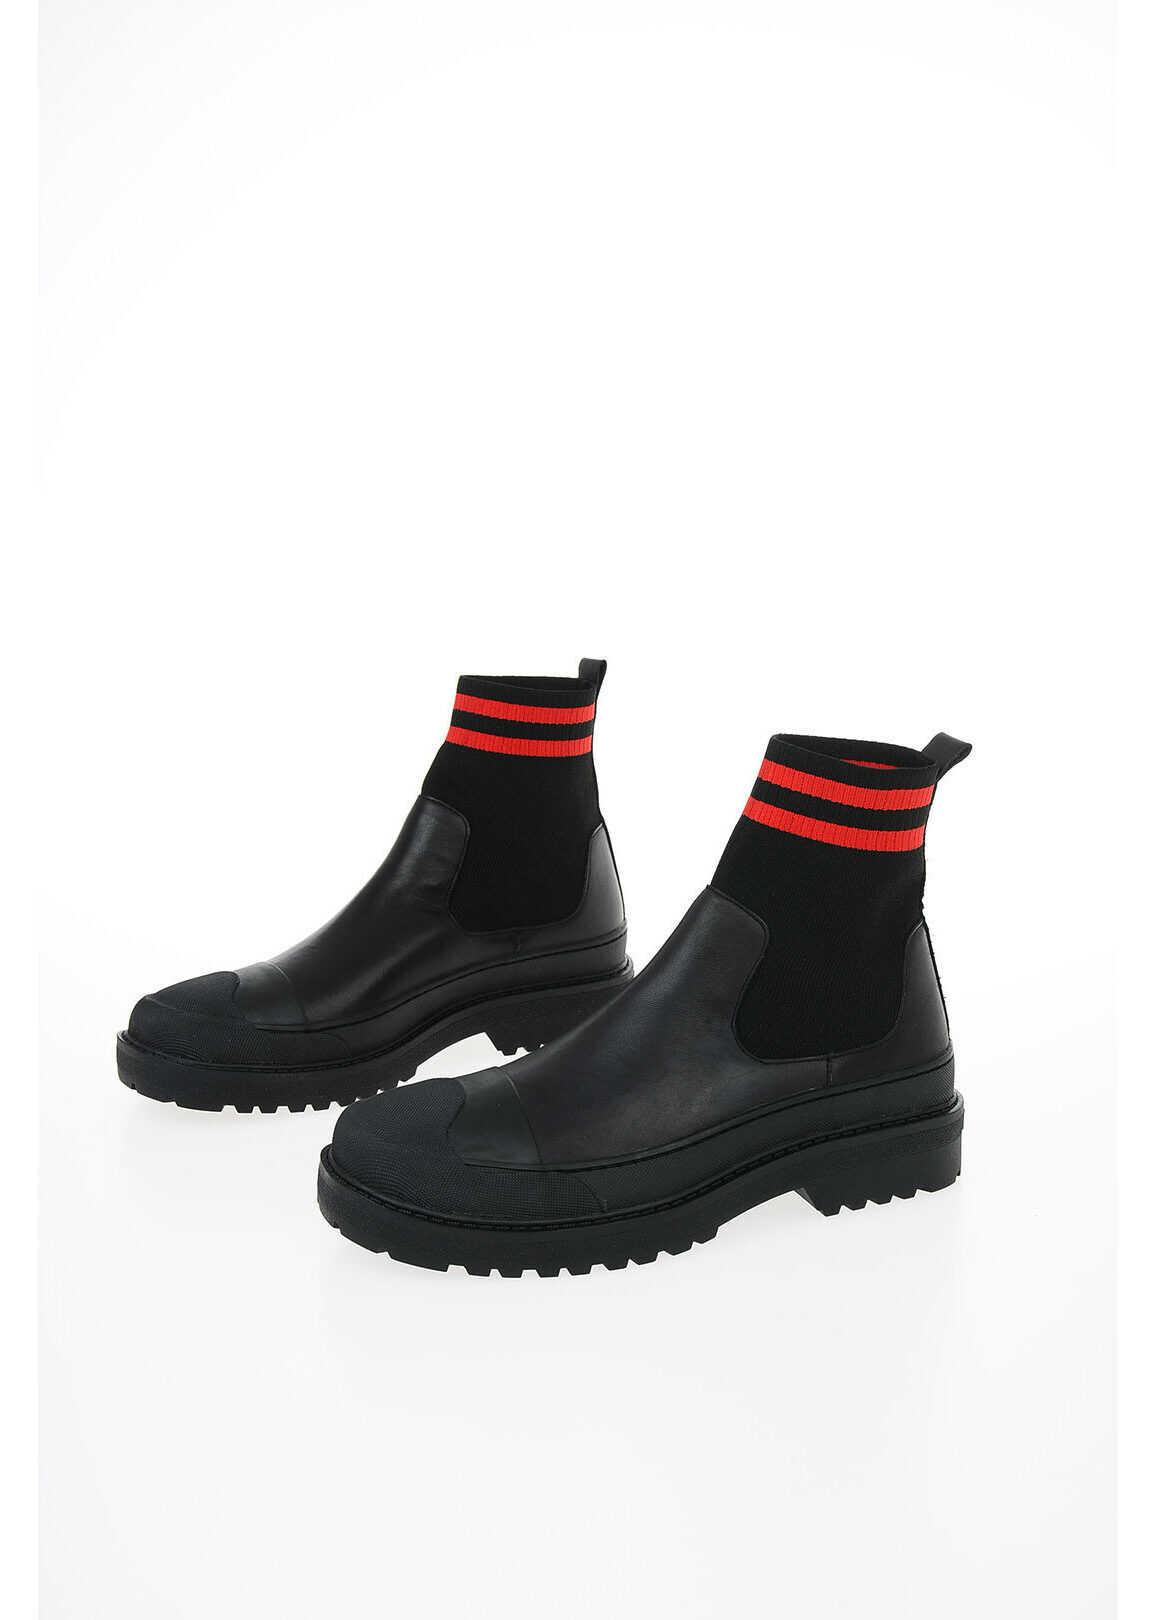 Neil Barrett Fabric HYBRID TANK SOCK Ankle Boot BLACK